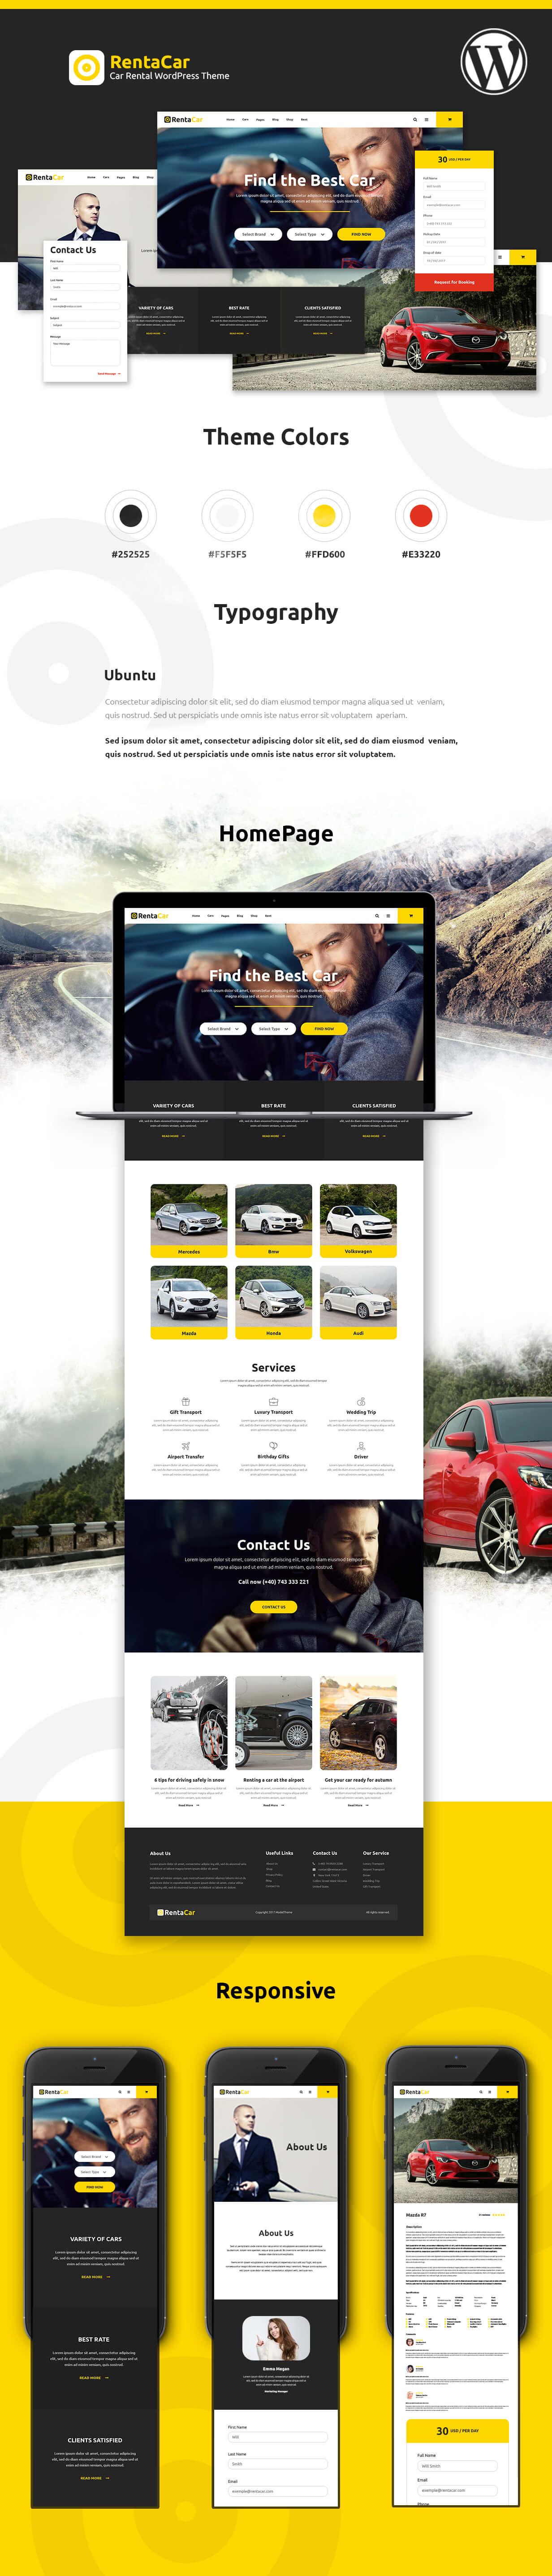 Rentacar - Car Rental / Listing WordPress Theme - 5